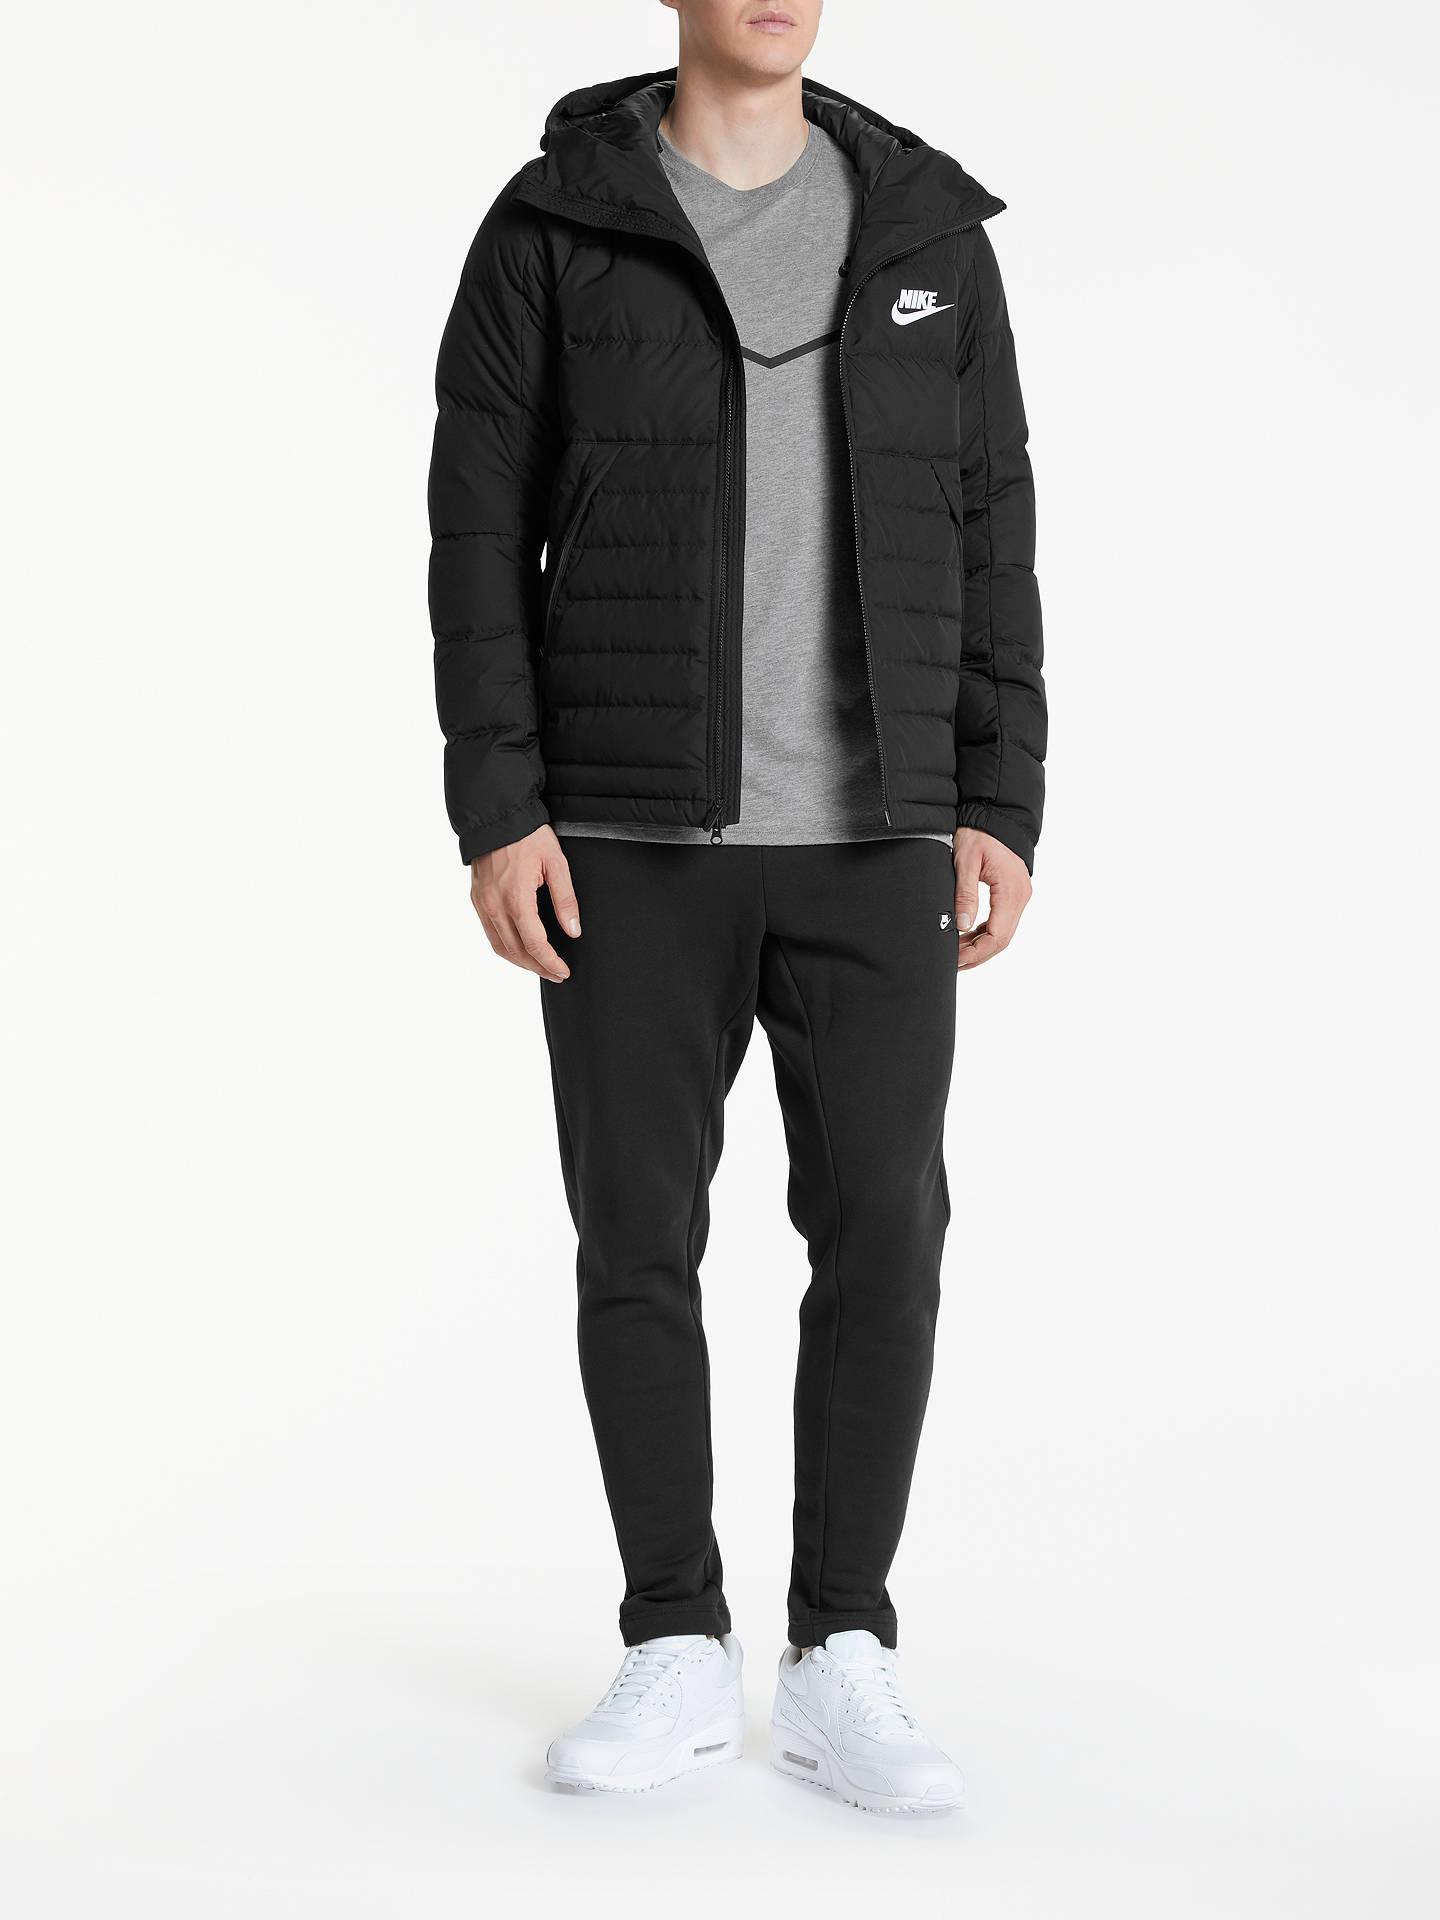 espiral Prestado abrigo  Nike Sportswear Down Insulated Jacket, Black at John Lewis & Partners